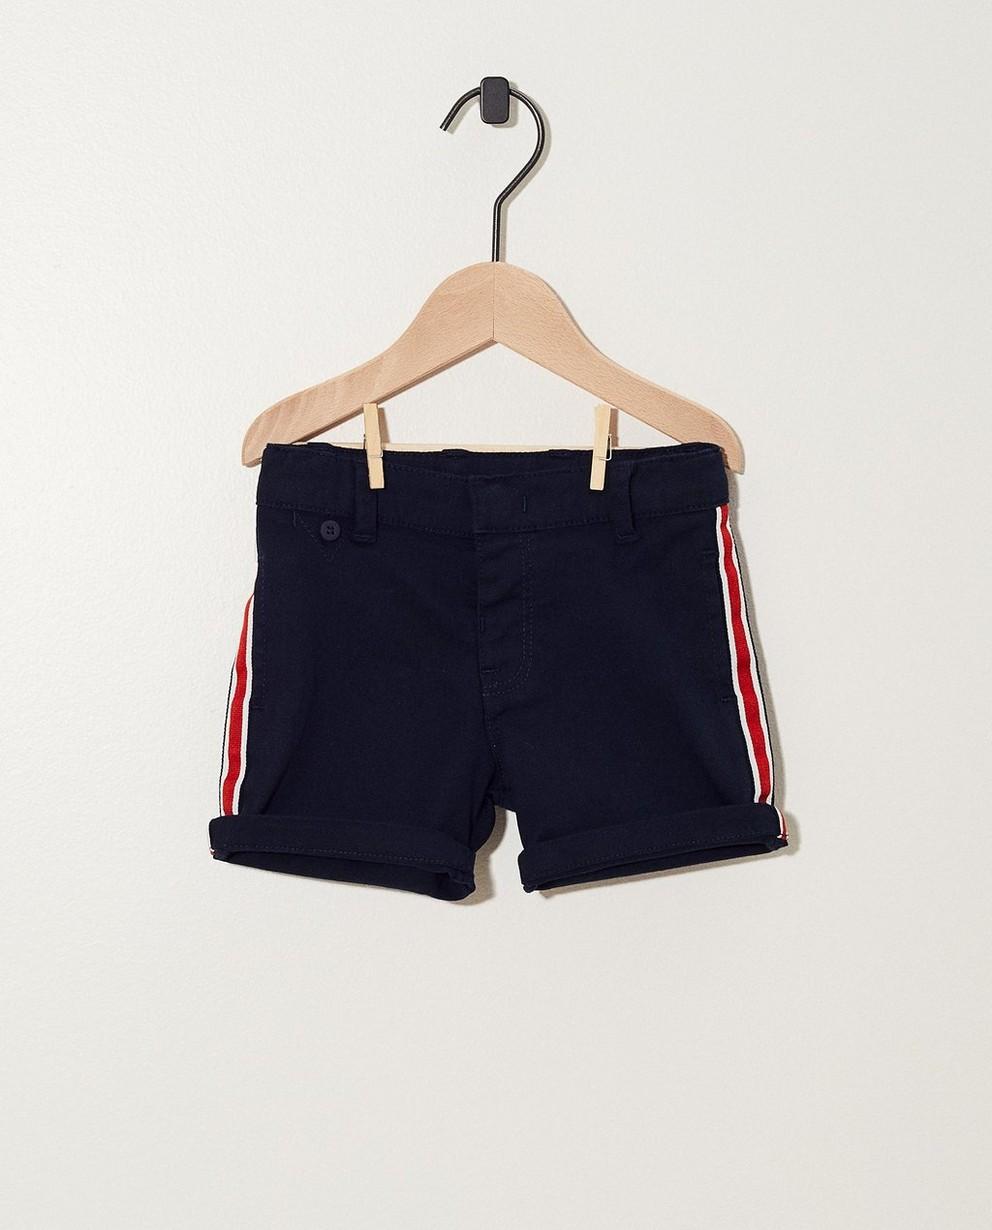 Short bleu foncé, rayure rouge - rayures blanches - JBC